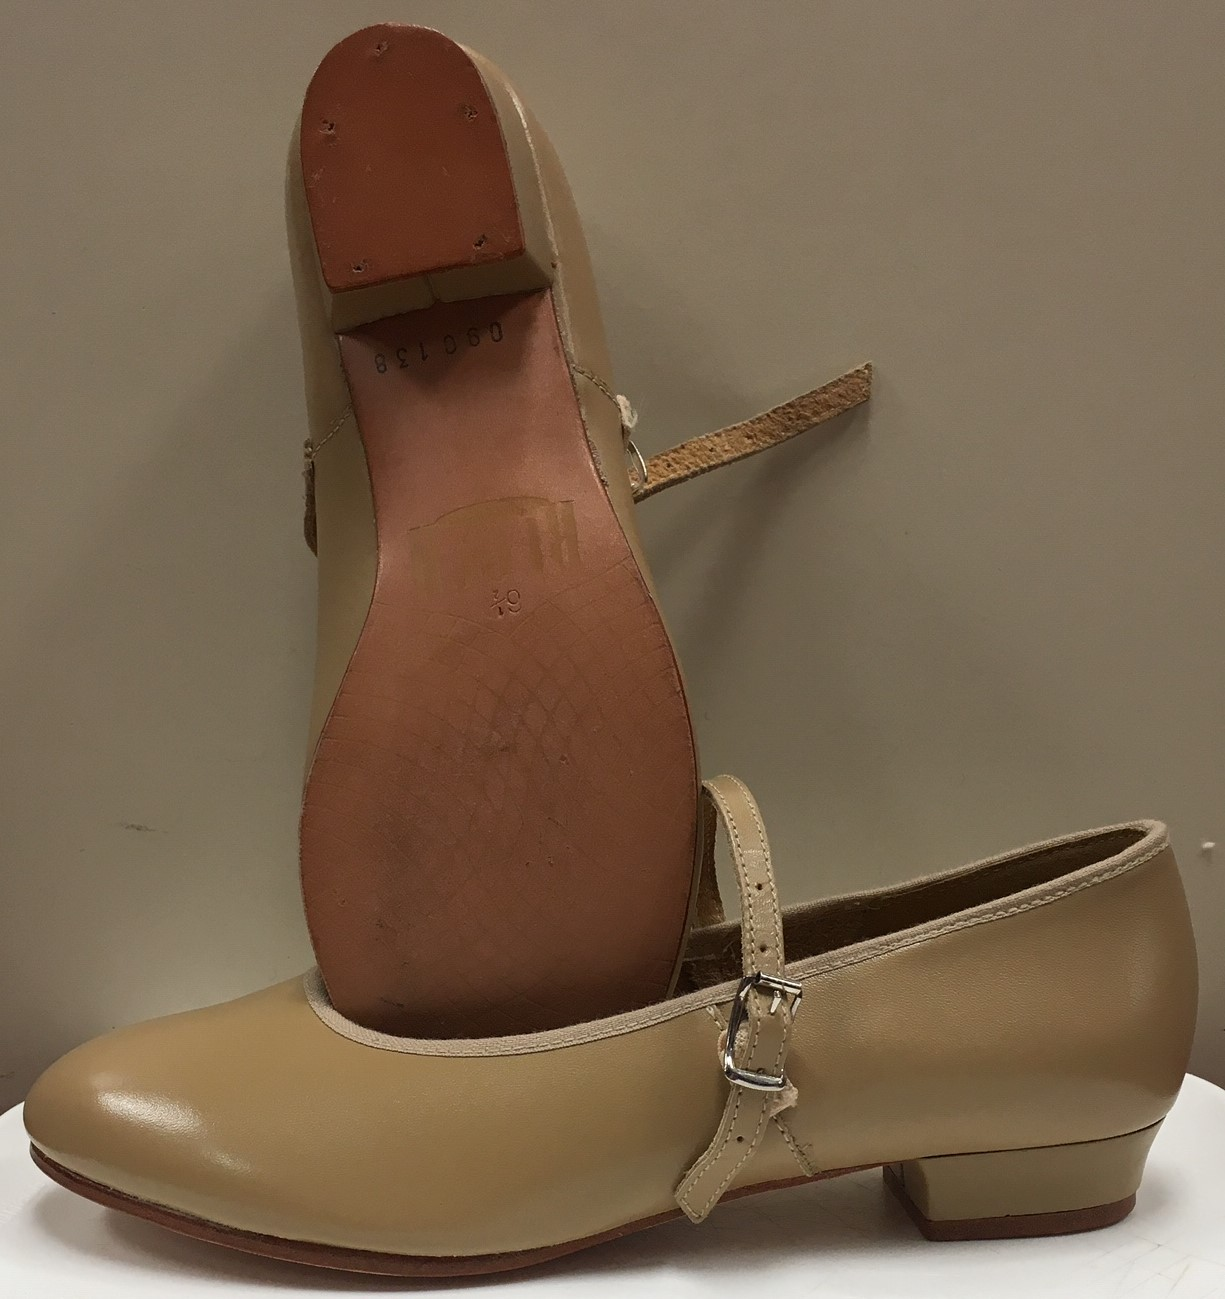 Bloch Children's Rhythm 1 Inch Heel Buckle Character Shoes